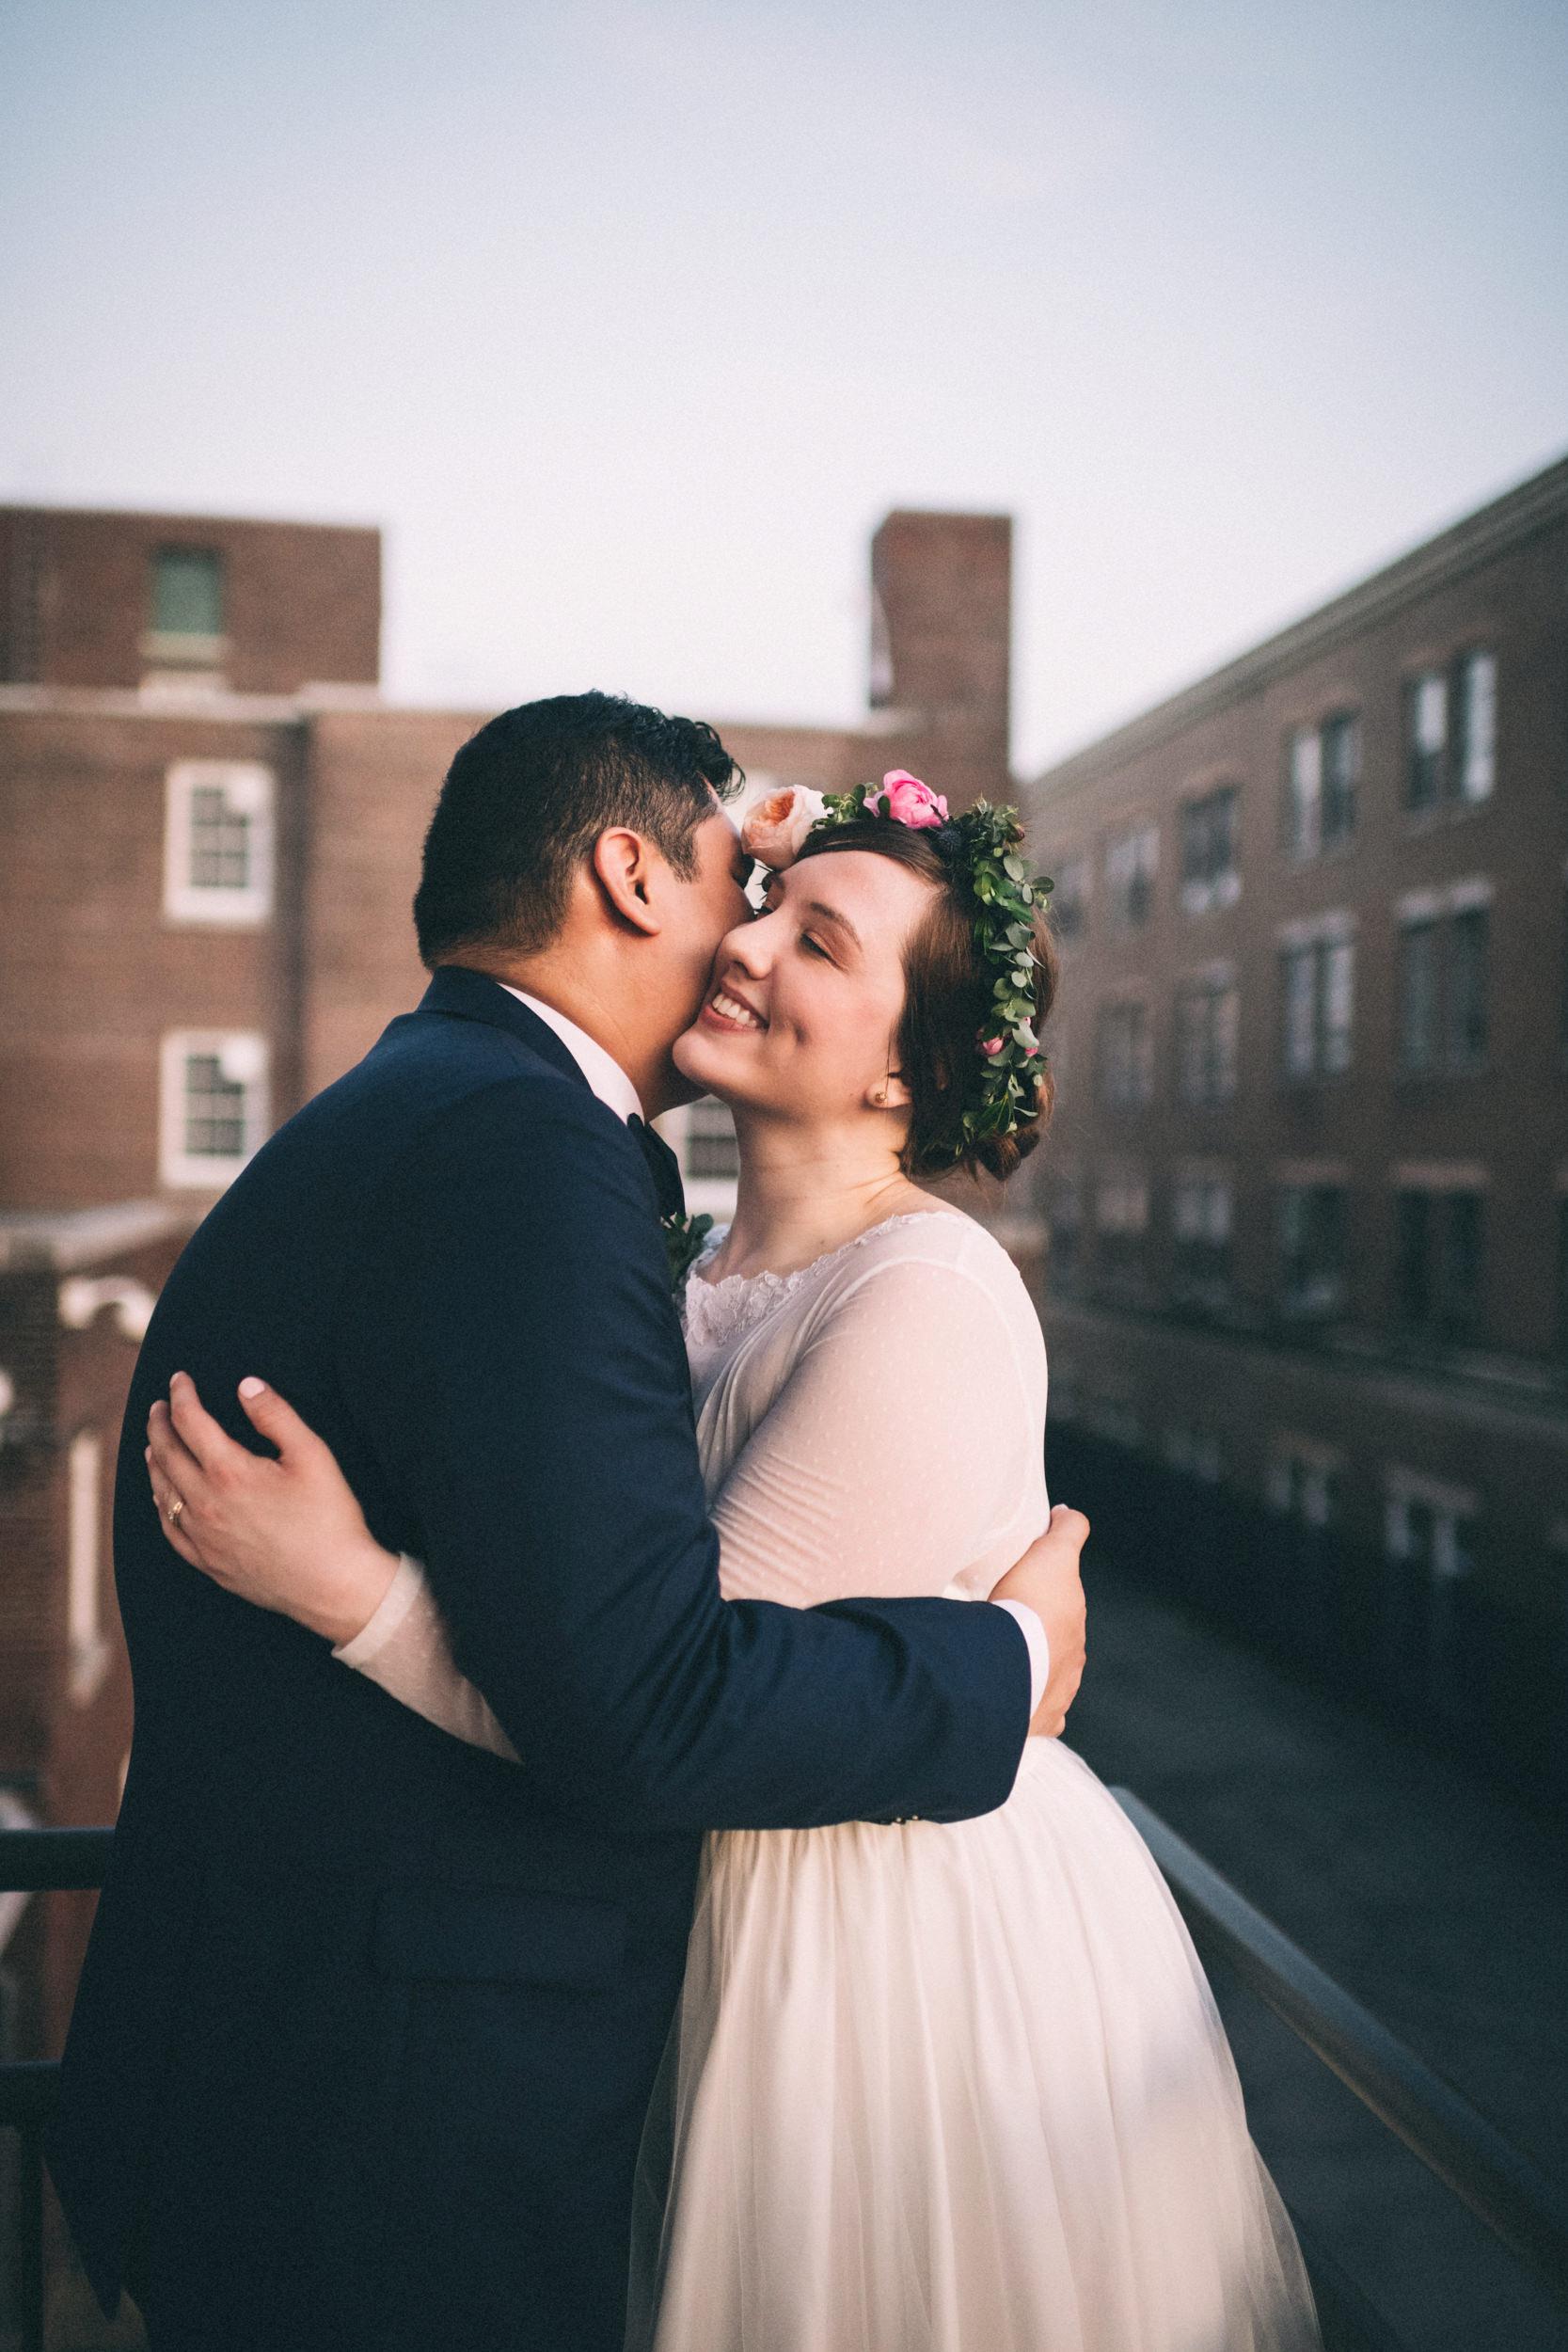 lauren-dean-wedding-grand-lodge-kentucky-sarah-katherine-davis-photography-659edit.jpg